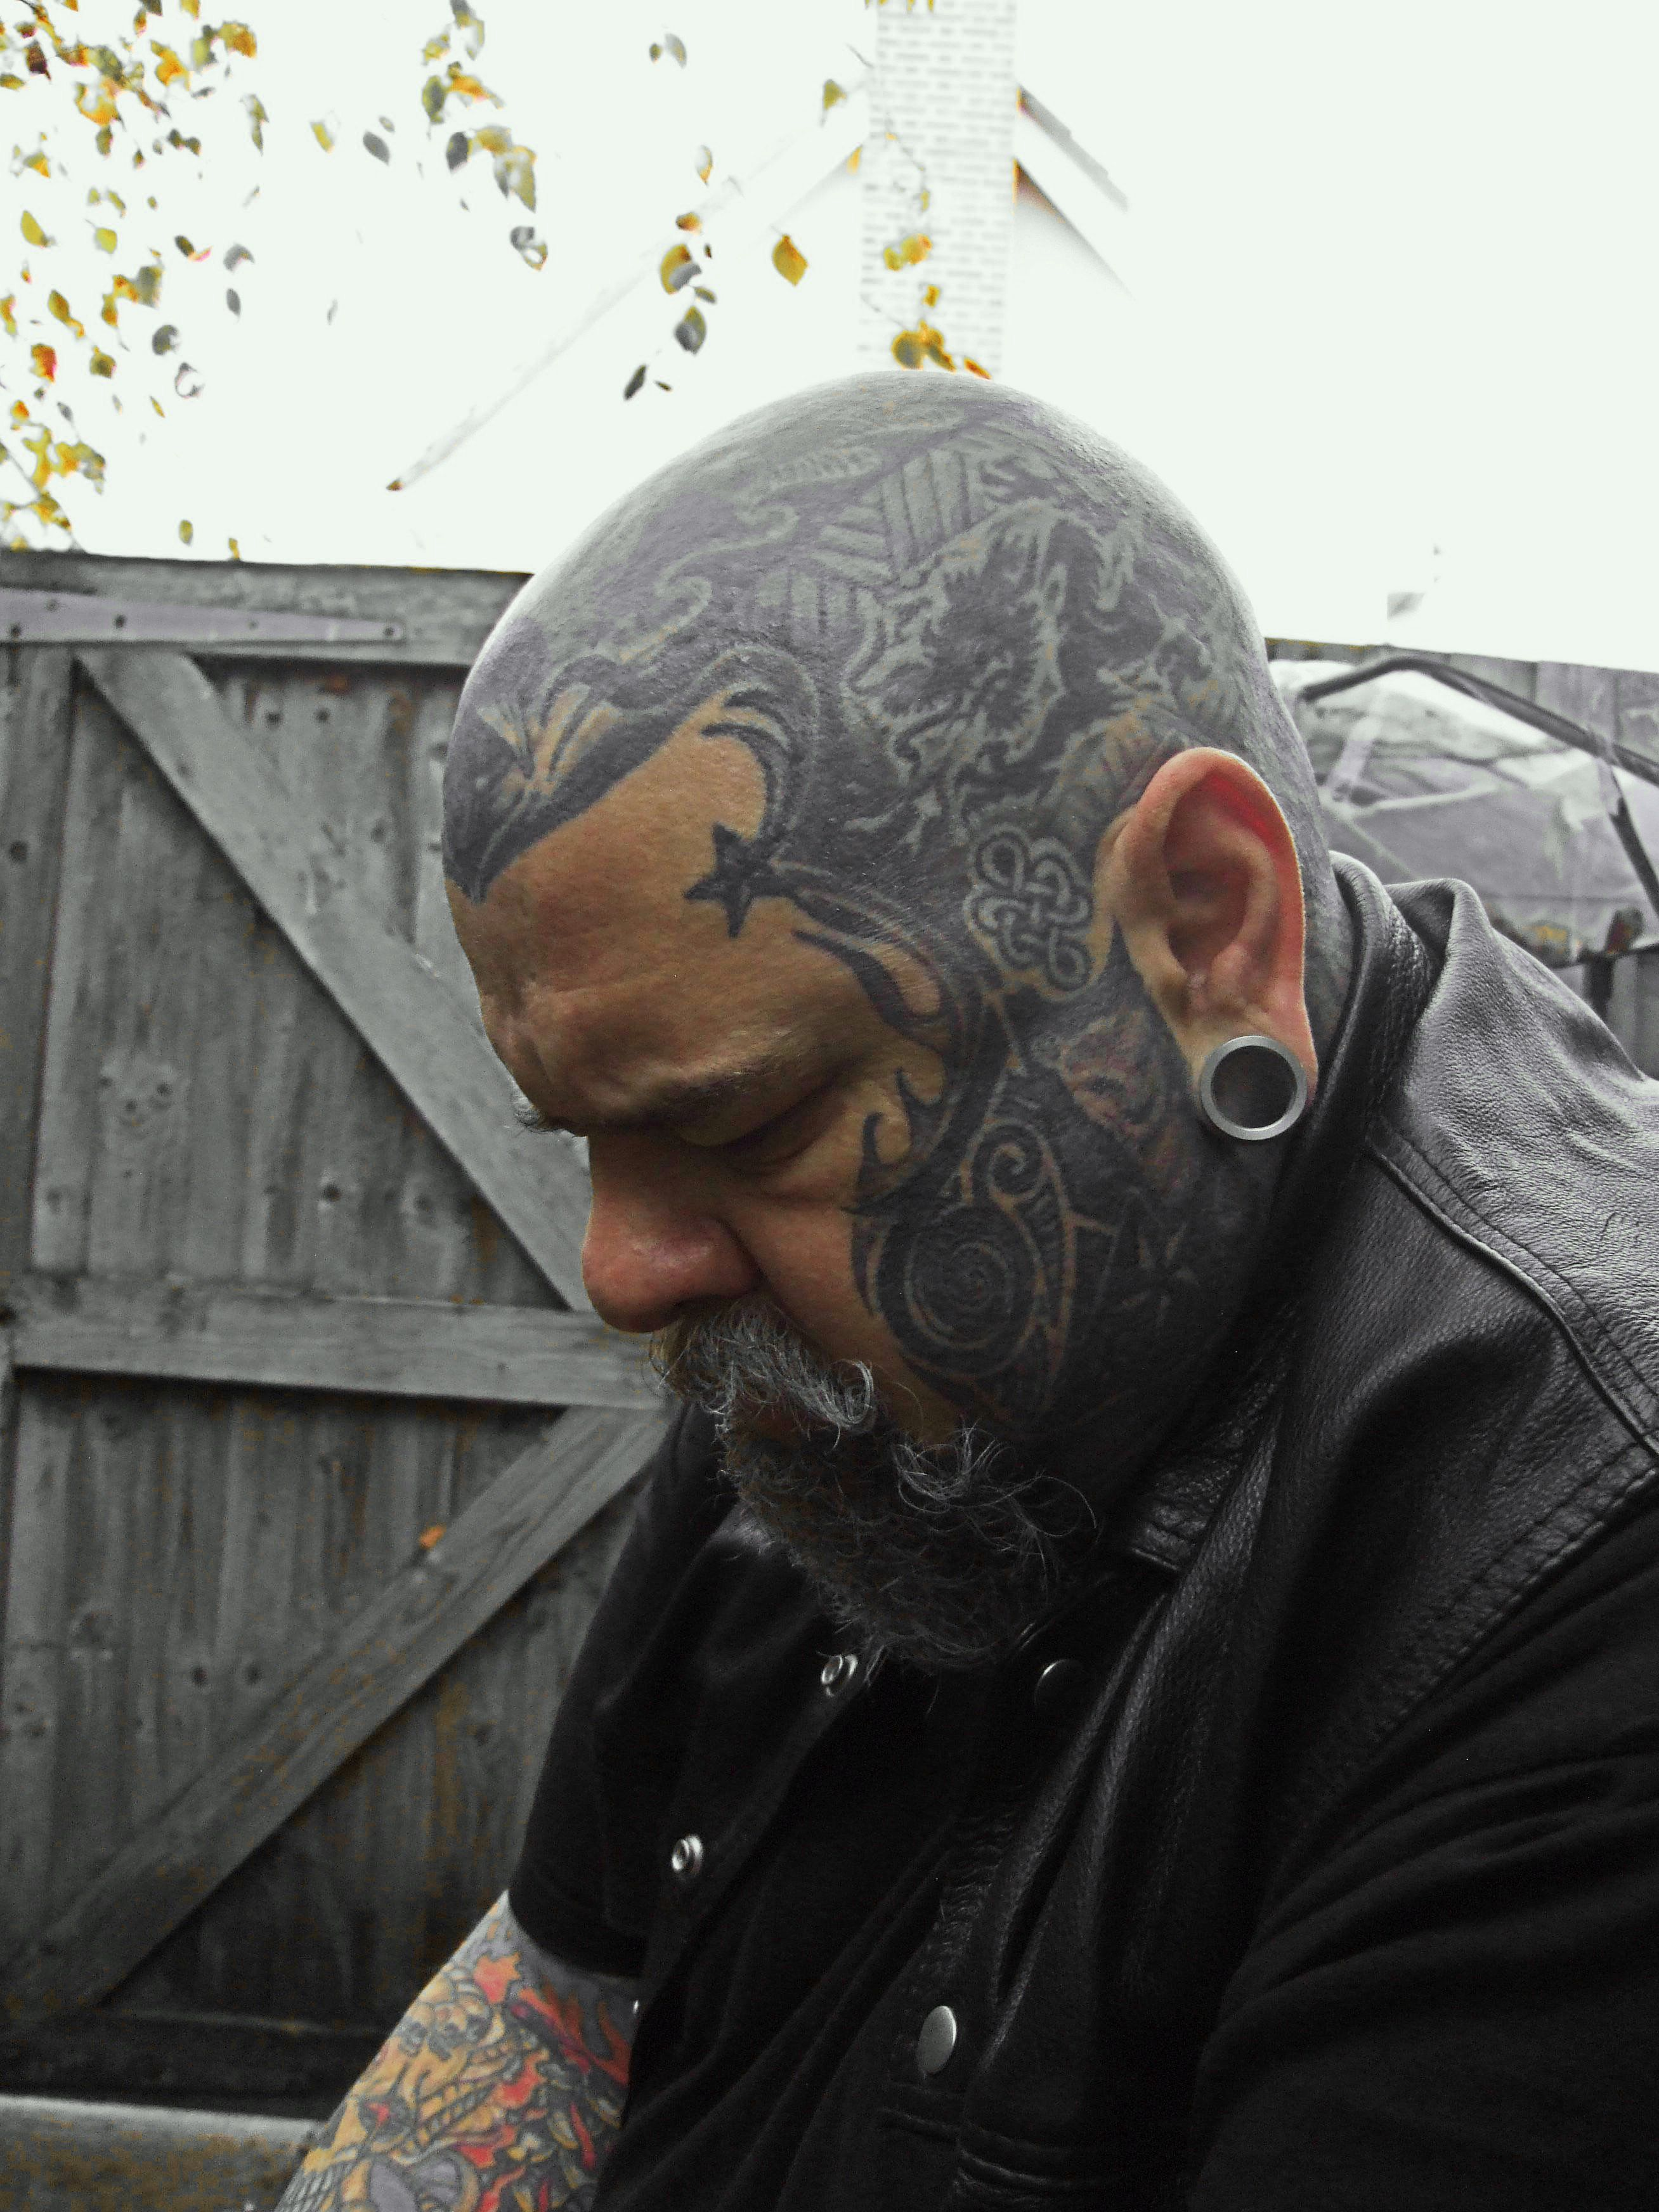 Songbird tattoo created at www mrsite com - Man Faces Tattoos